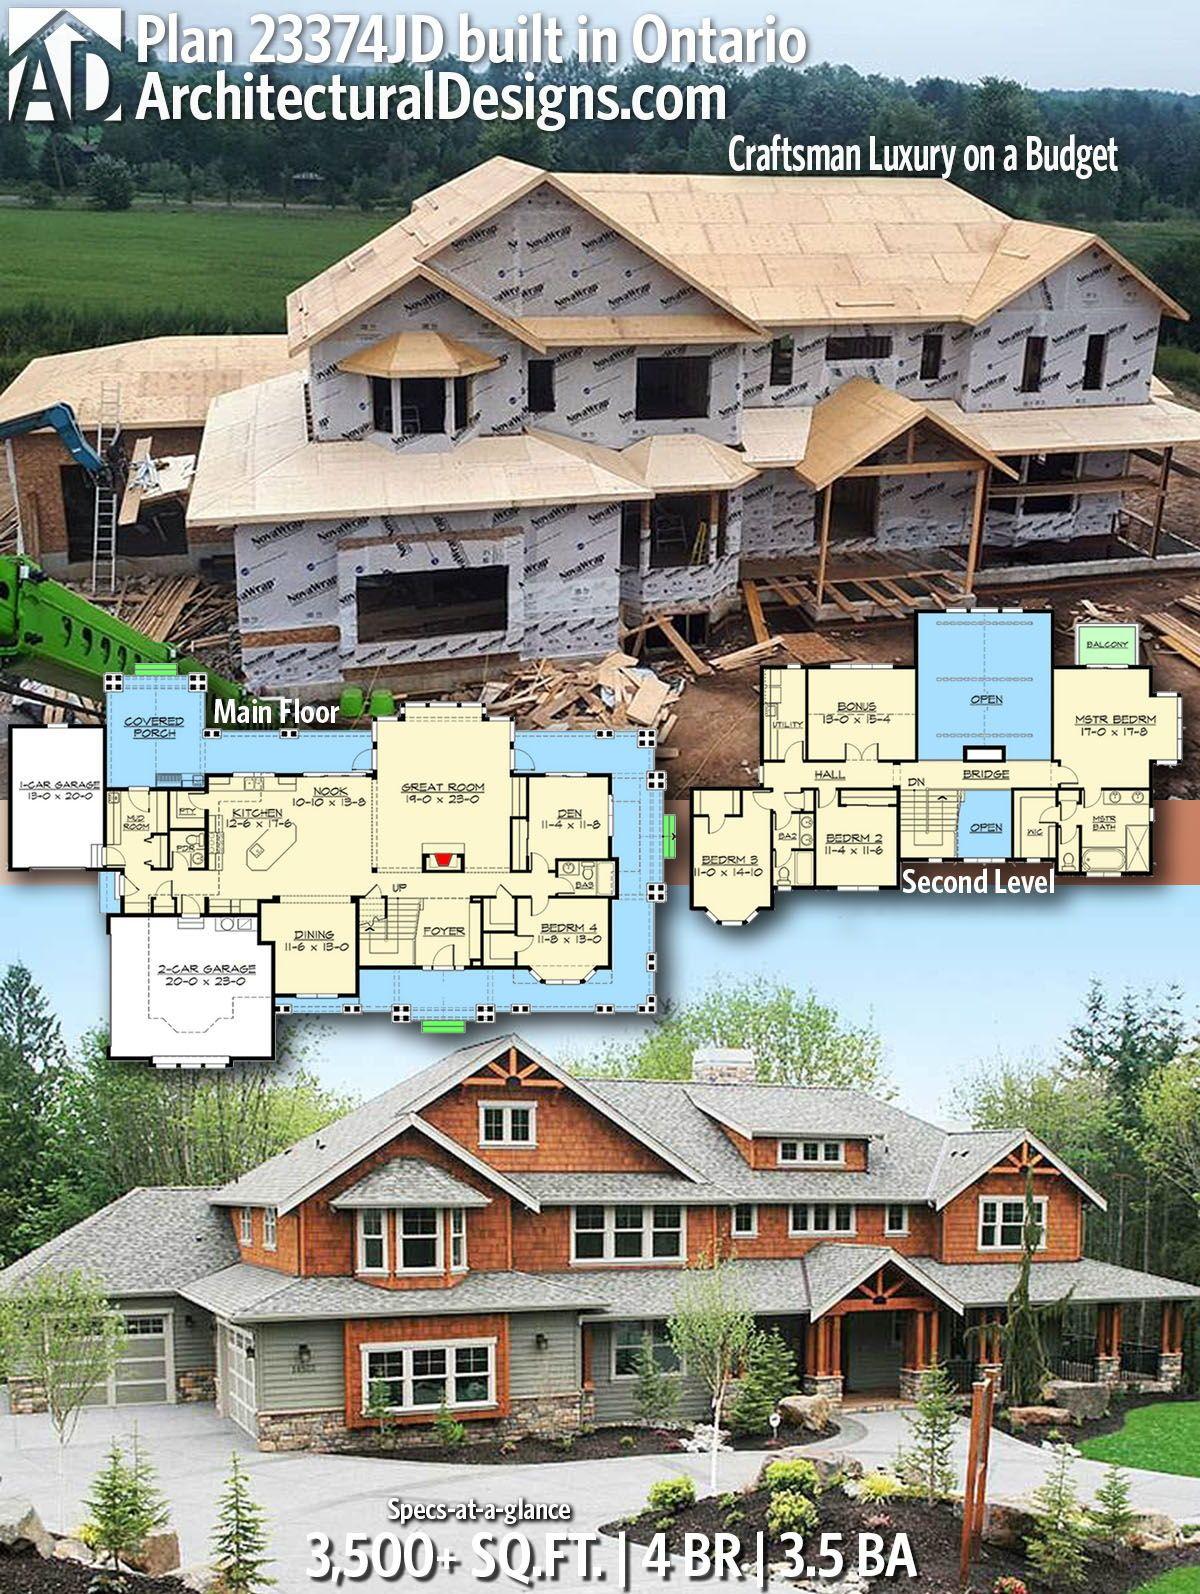 Plan 23374jd Craftsman Luxury On A Budget Luxury Craftsman House Plans Craftsman House Plans Dream House Plans